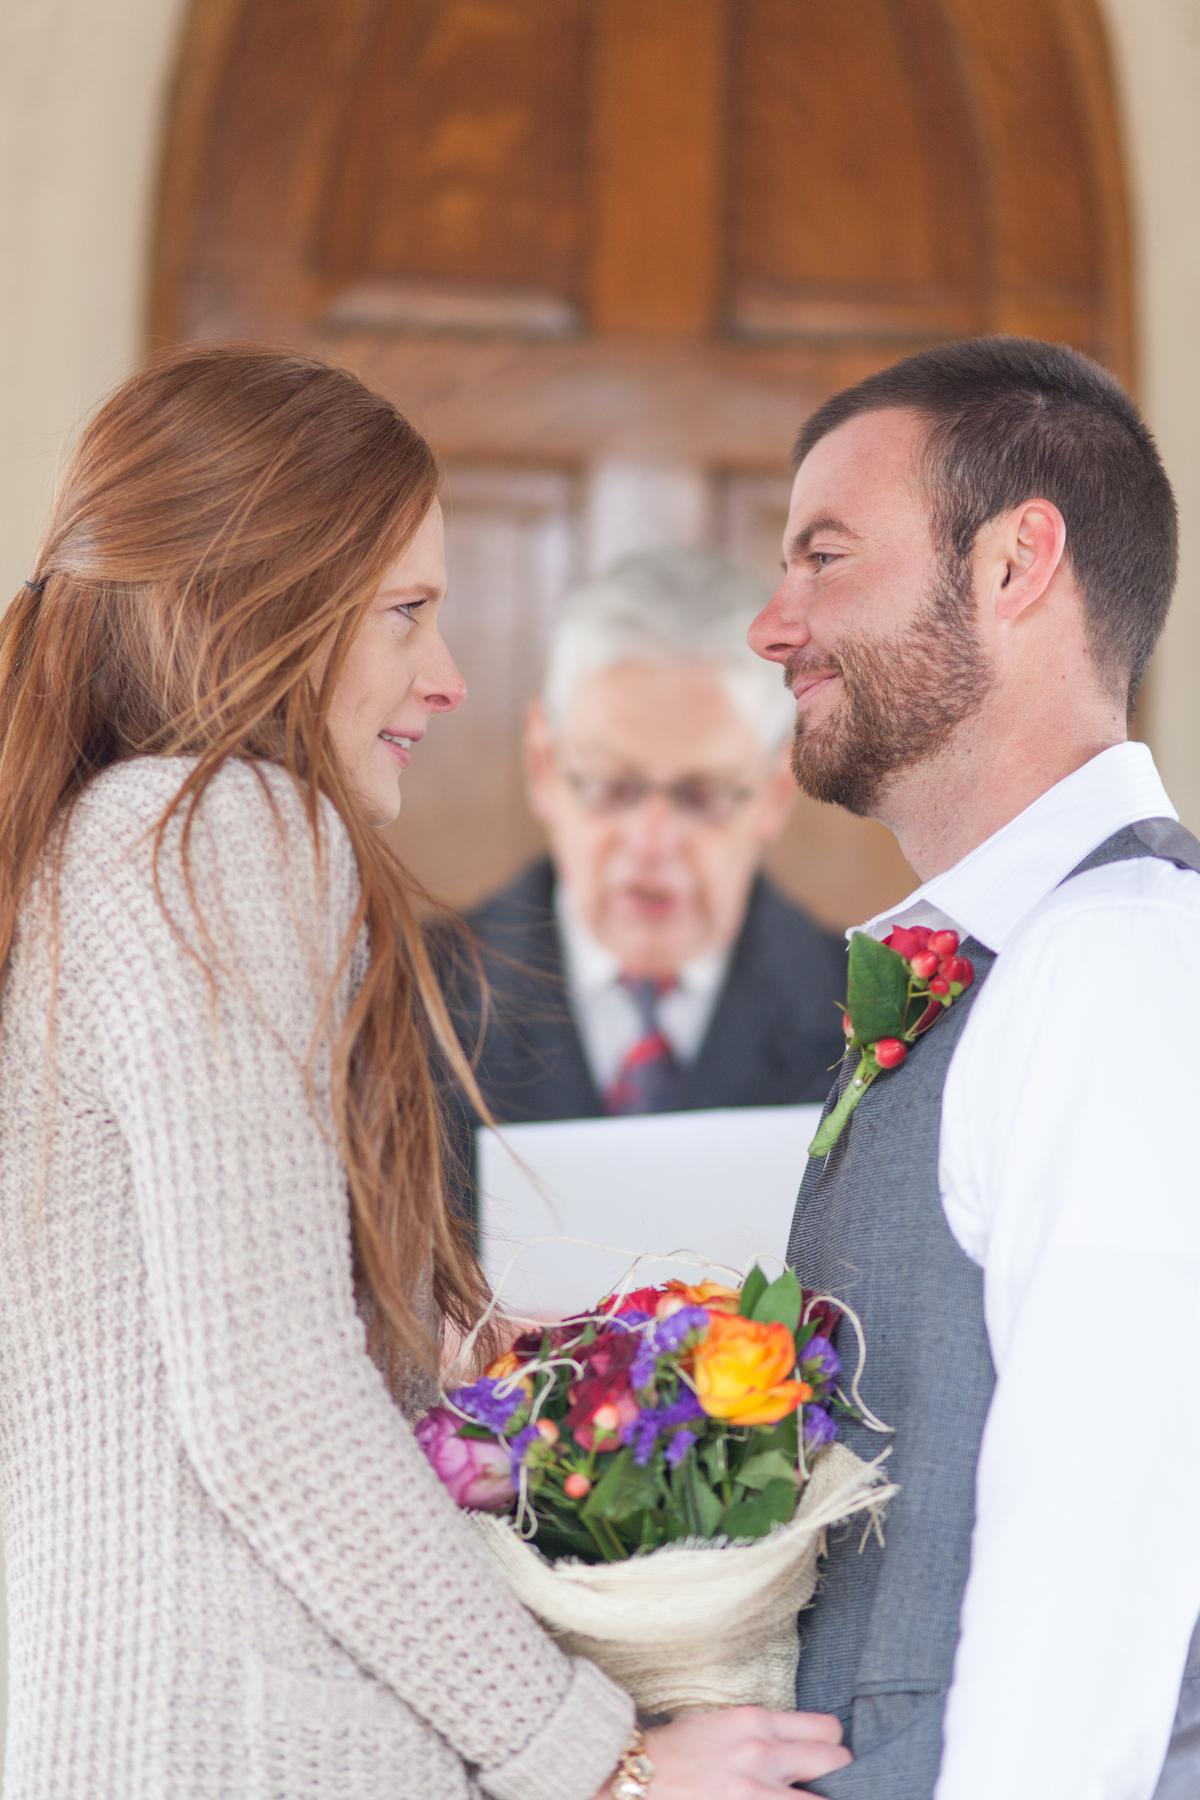 chapel_dulcinea_elopement_photography_austin_wedding_photographer-12.jpg